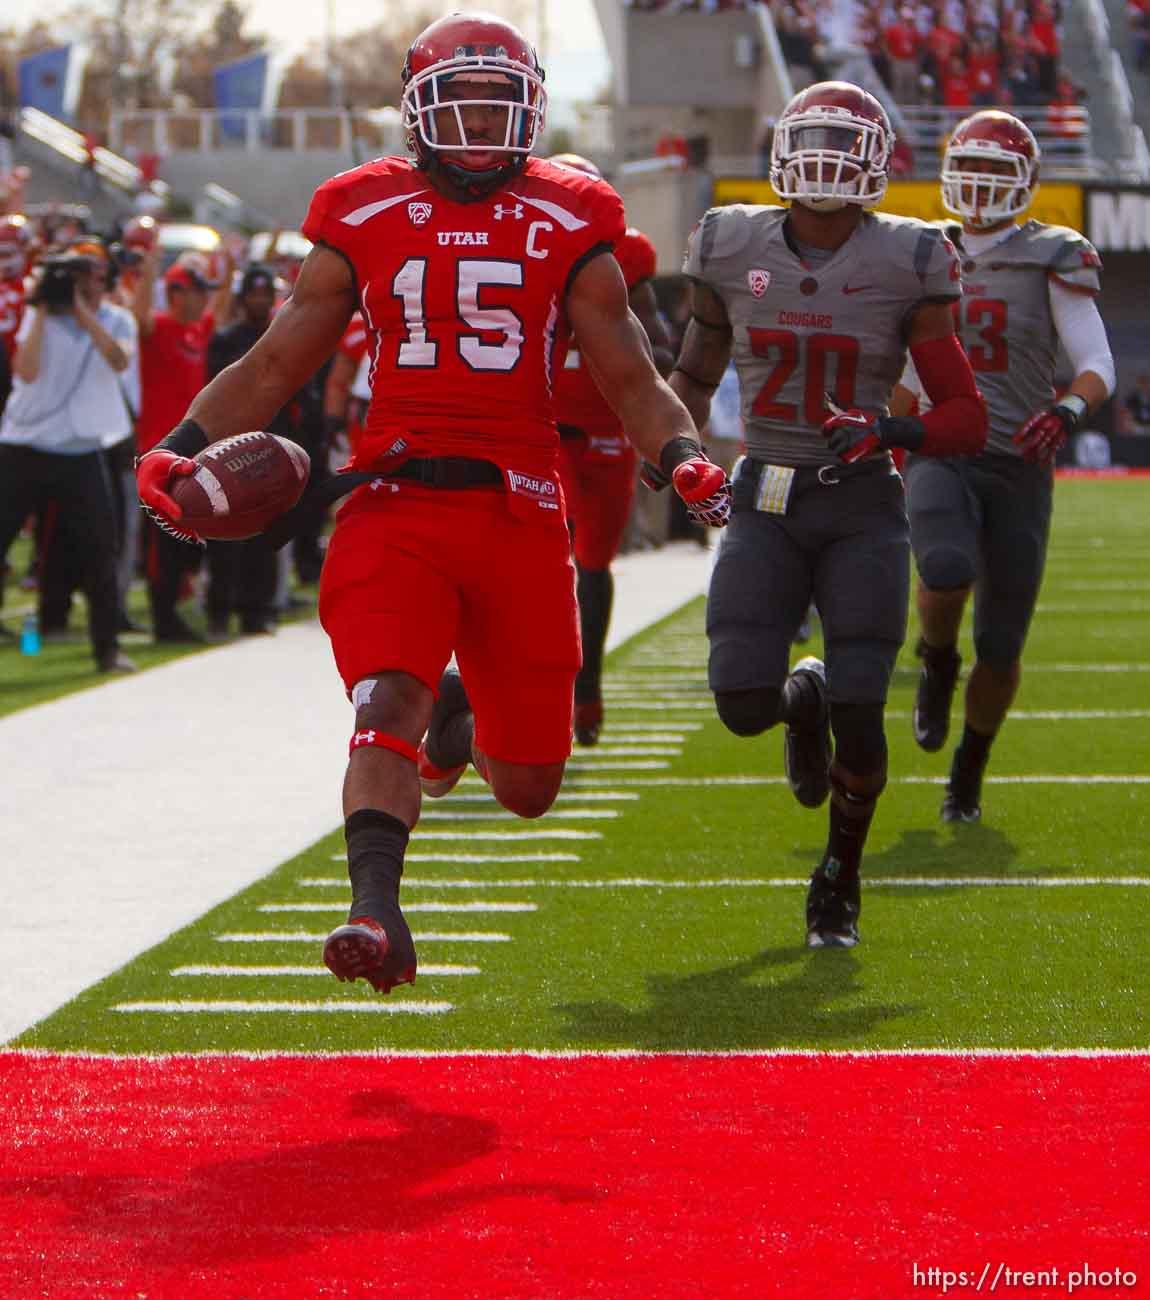 Trent Nelson | The Salt Lake Tribune Utah running back John White (15) runs for a first quarter touchdown as Utah hosts Washington State, college football at Rice-Eccles Stadium Saturday November 3, 2012 in Salt Lake City.